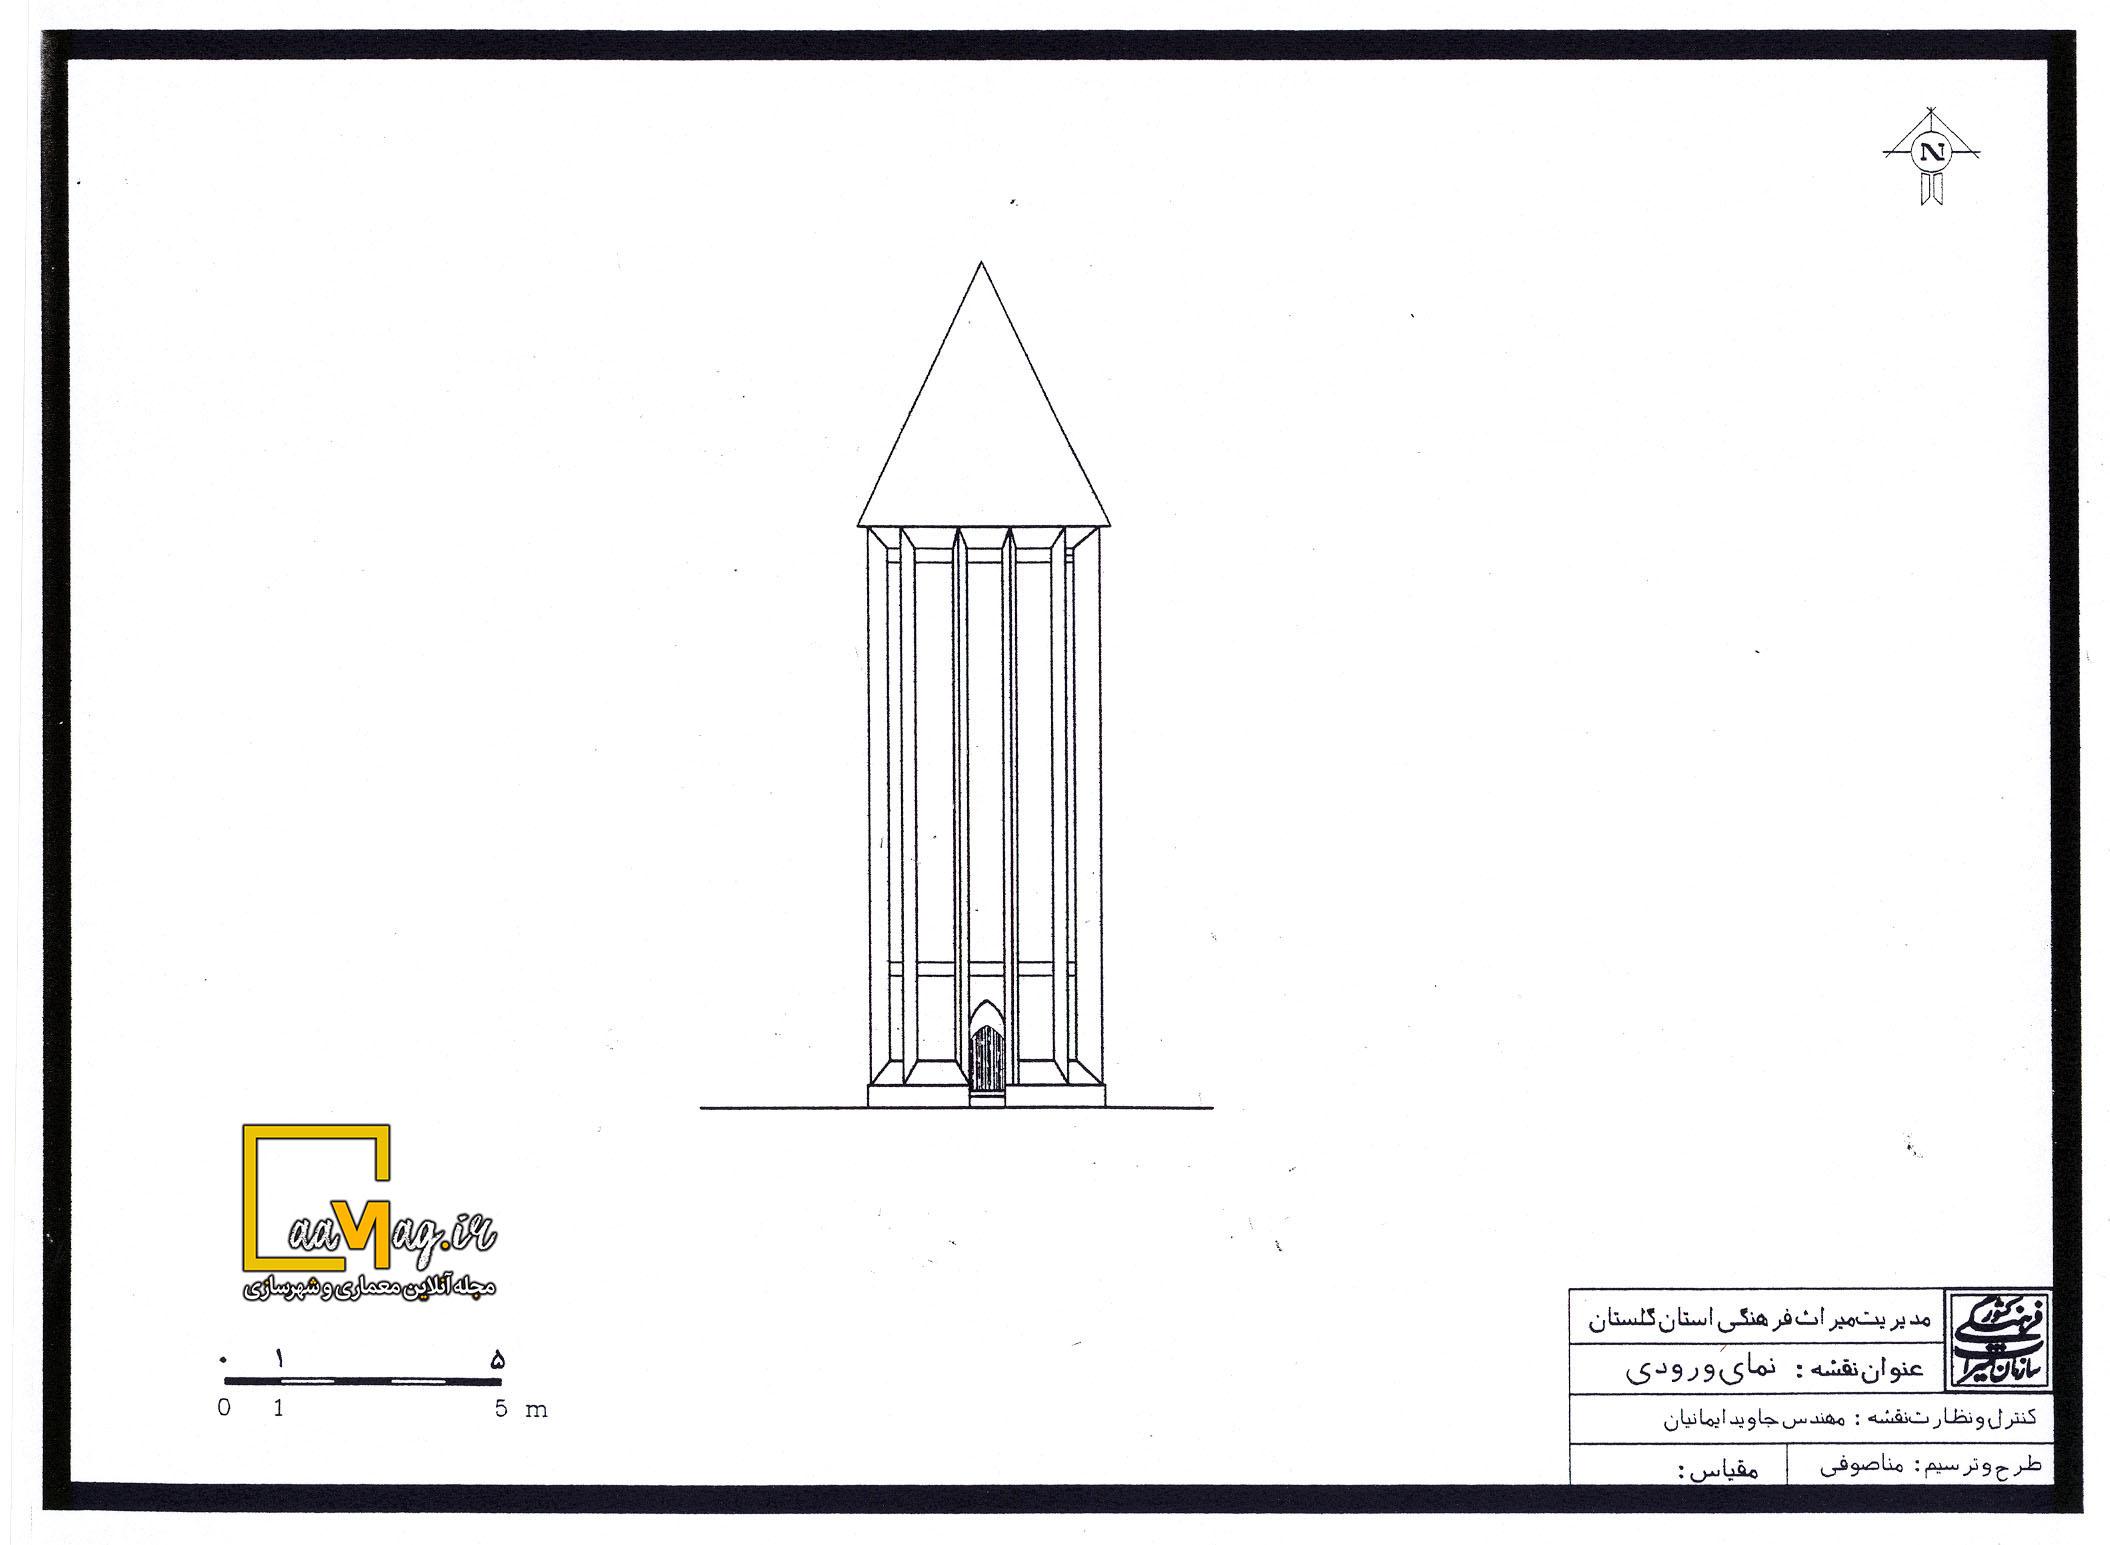 نما ورودی برج گنبد قابوس